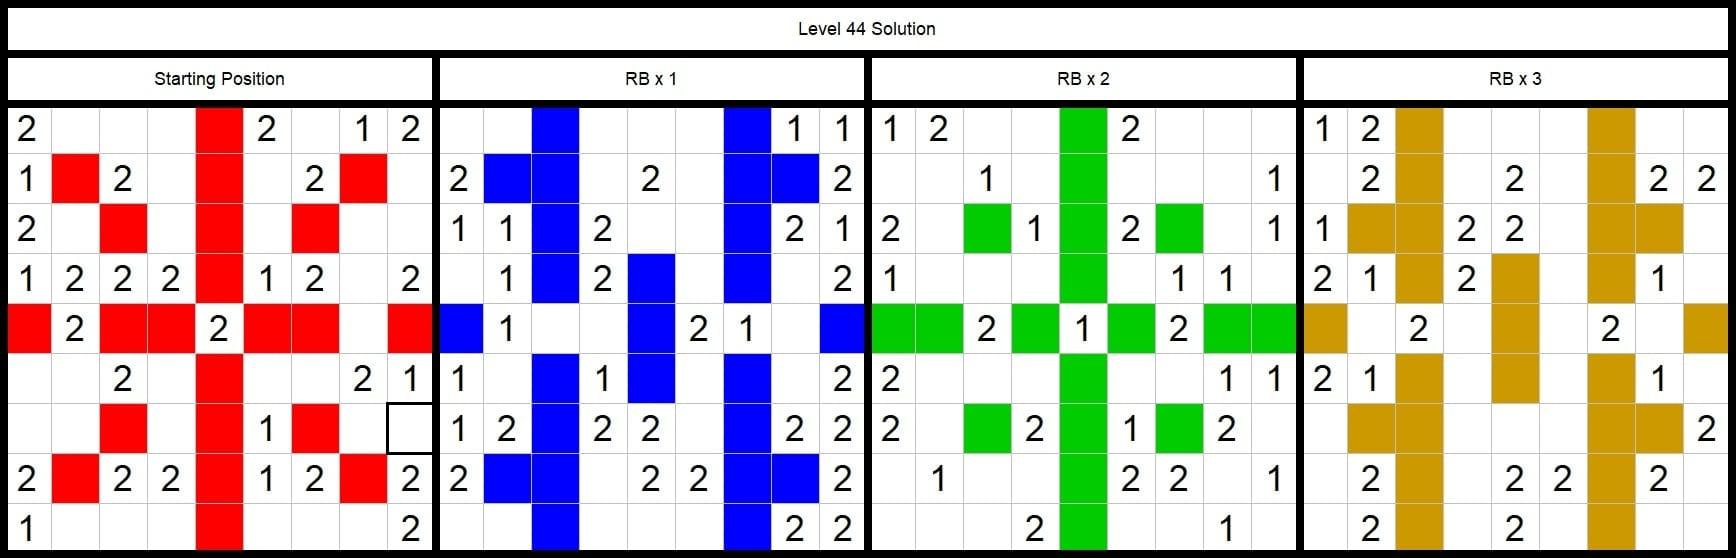 Level 44 Solution